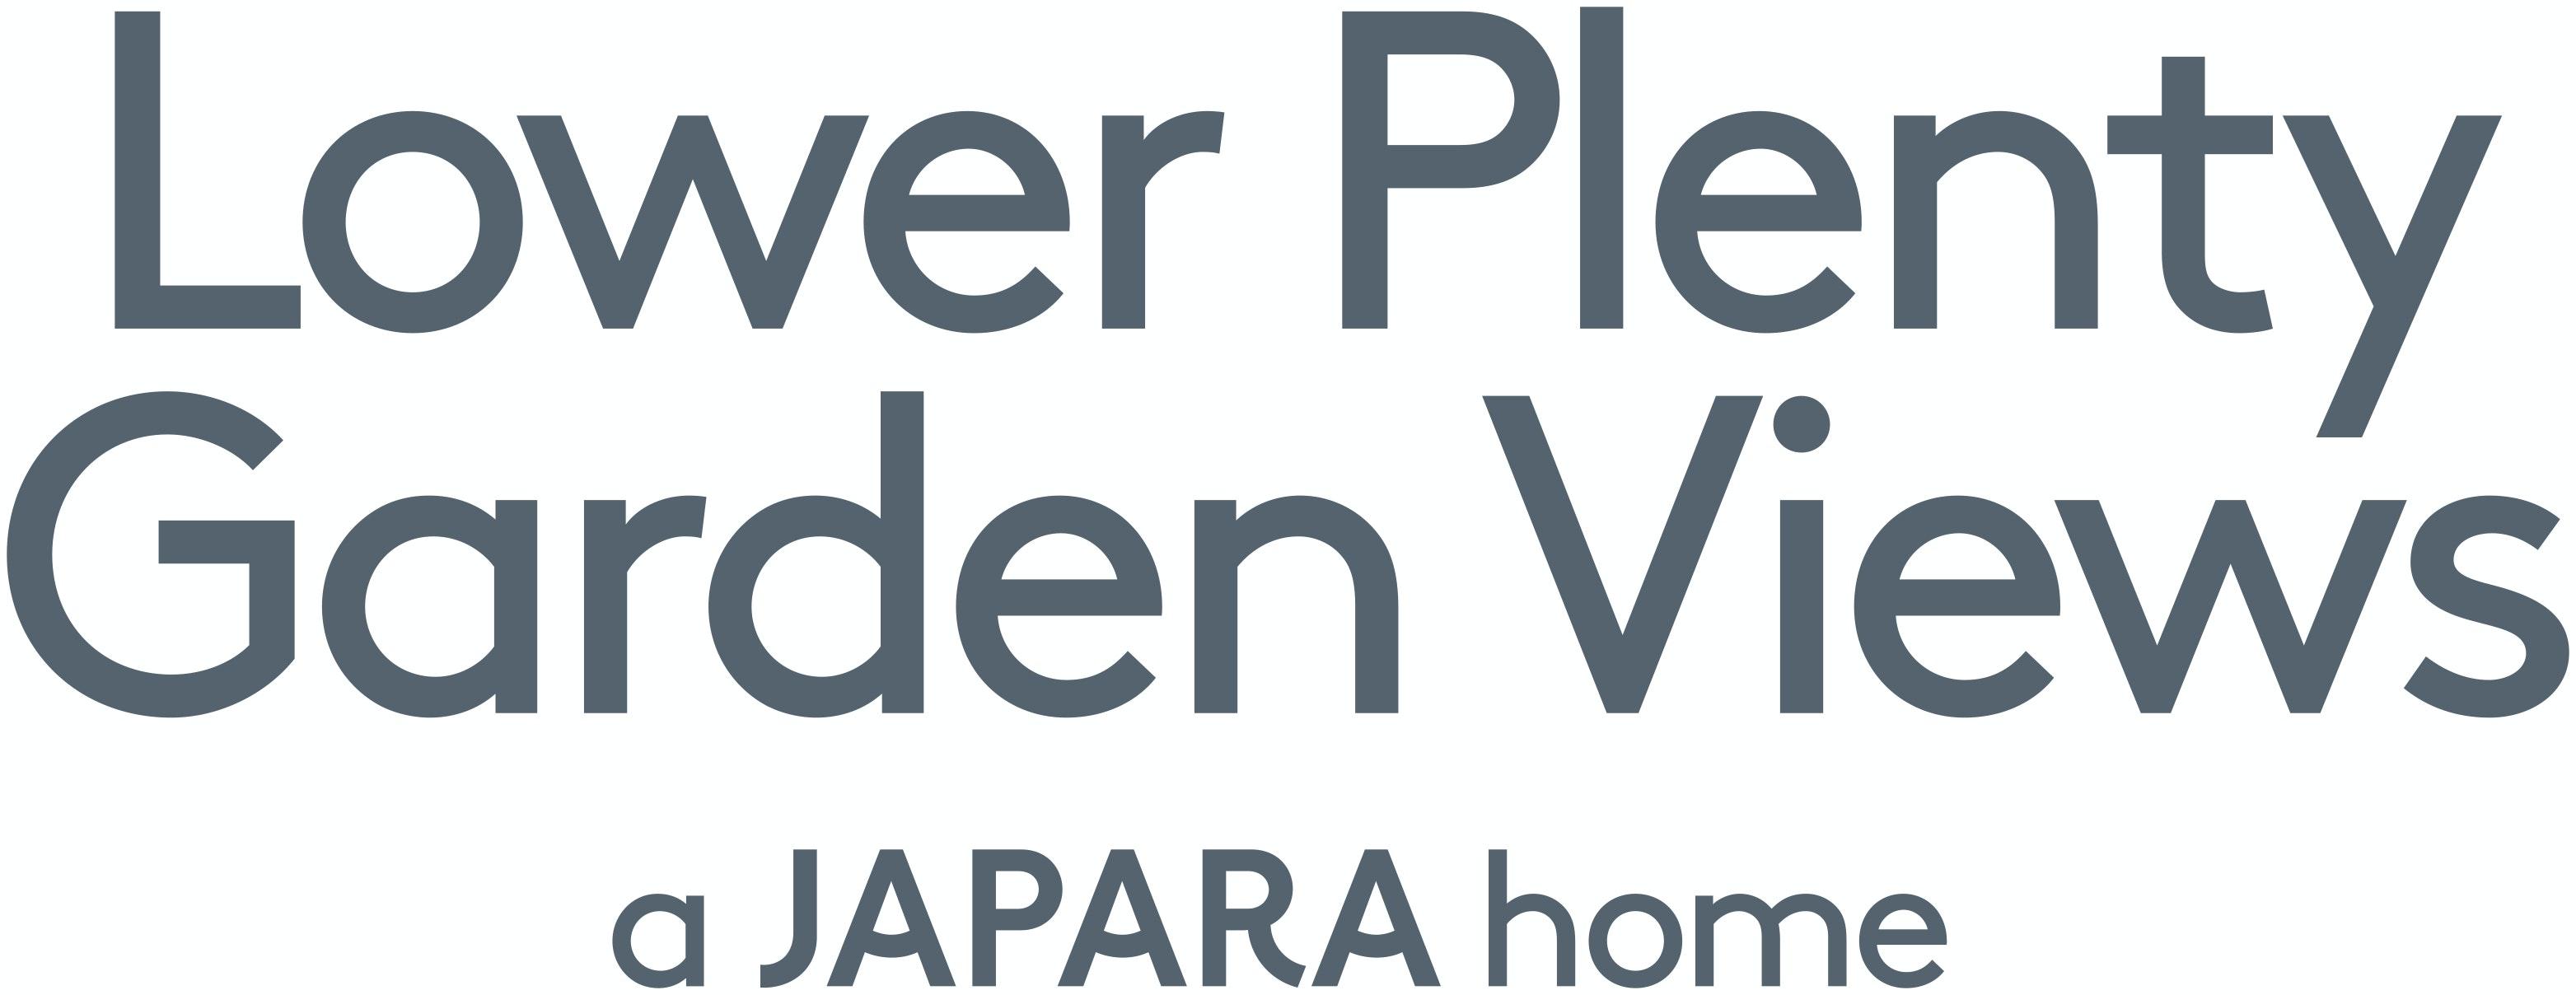 Lower Plenty Garden Views logo